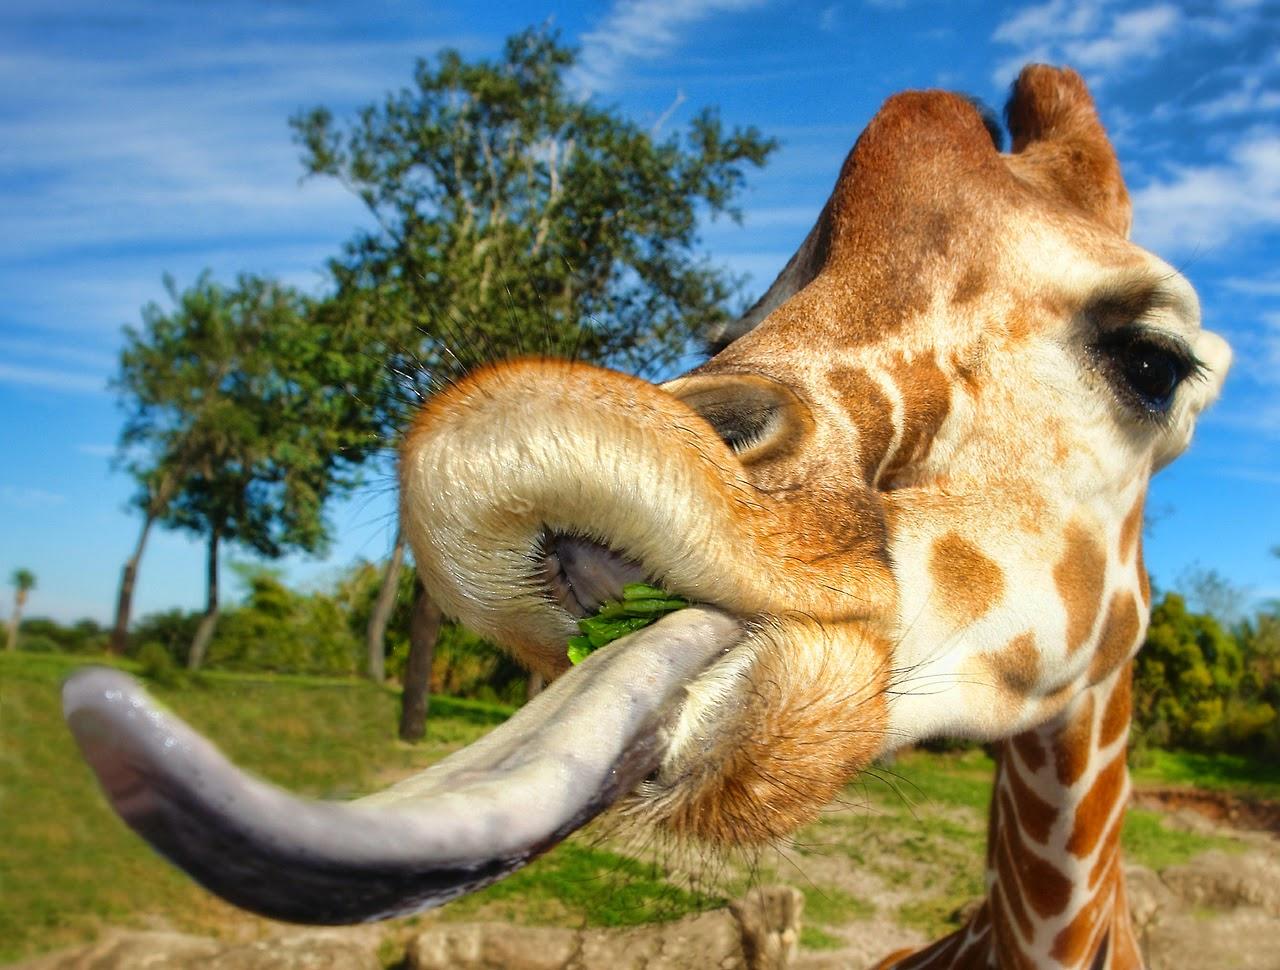 Giraffe tongue - photo#6